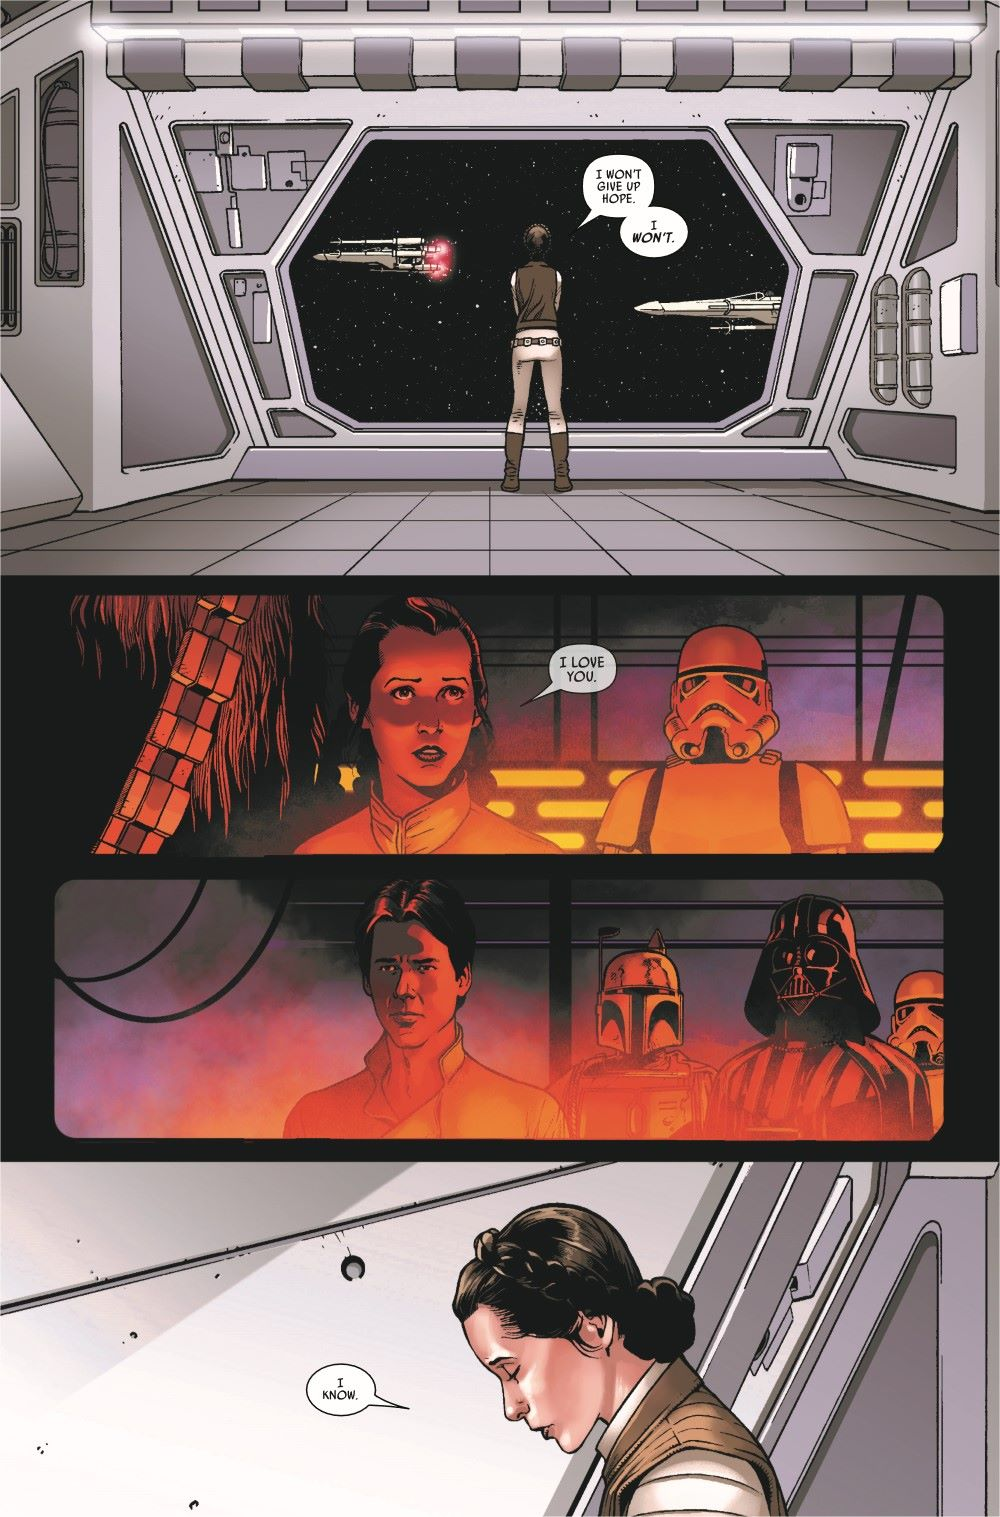 STWARS2020012_Preview-3 ComicList Previews: STAR WARS #12